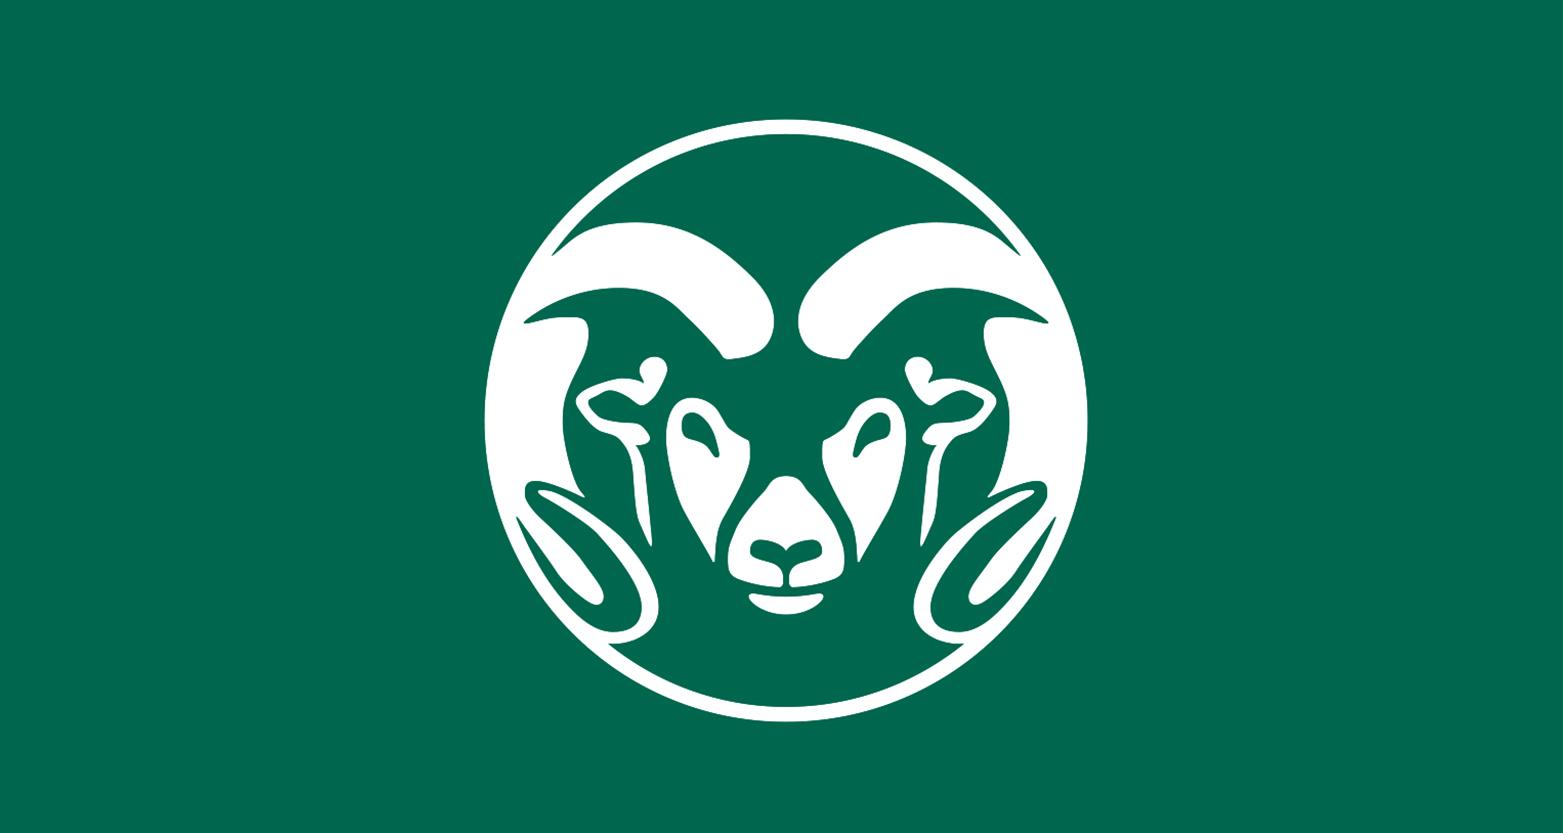 Colorado State University Cases & Skins | Official CSU Gear